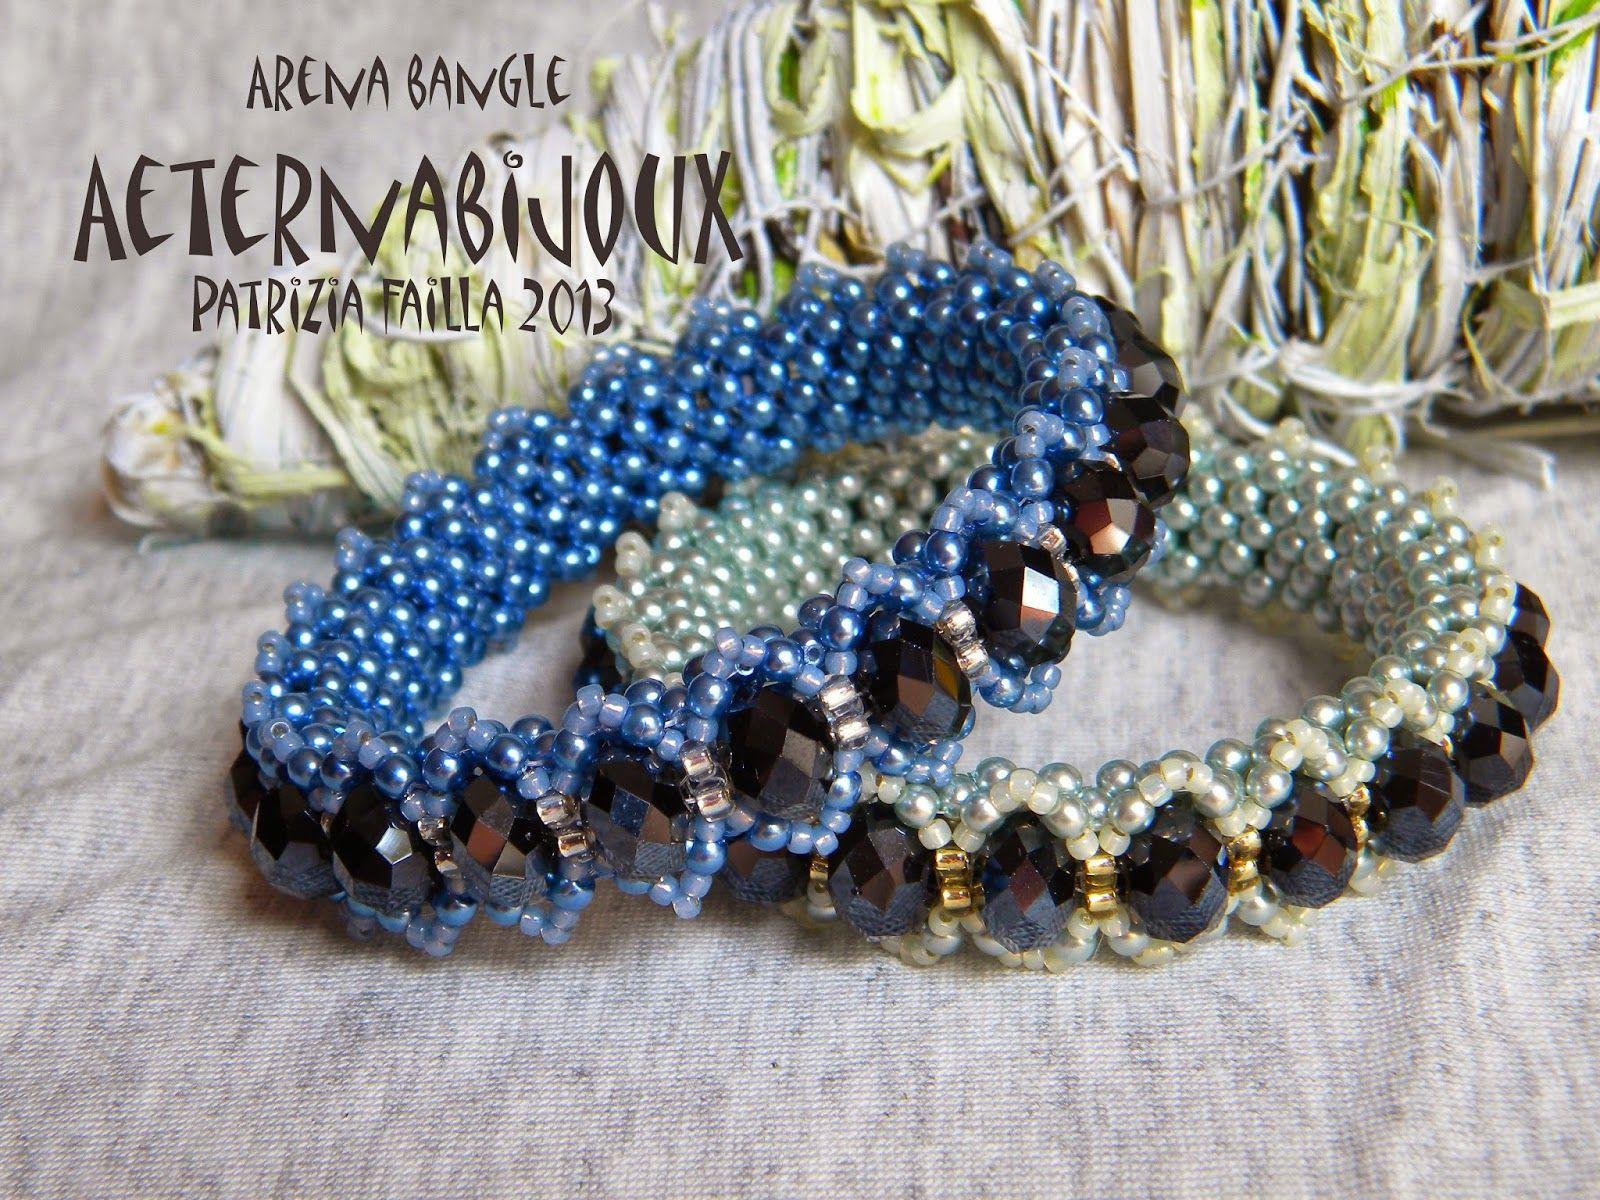 AETERNA BIJOUX by Patrizia Failla jewelry designer: PF 09 ARENA BANGLE (PDF: 28 pagine)  Italiano/ Eng...